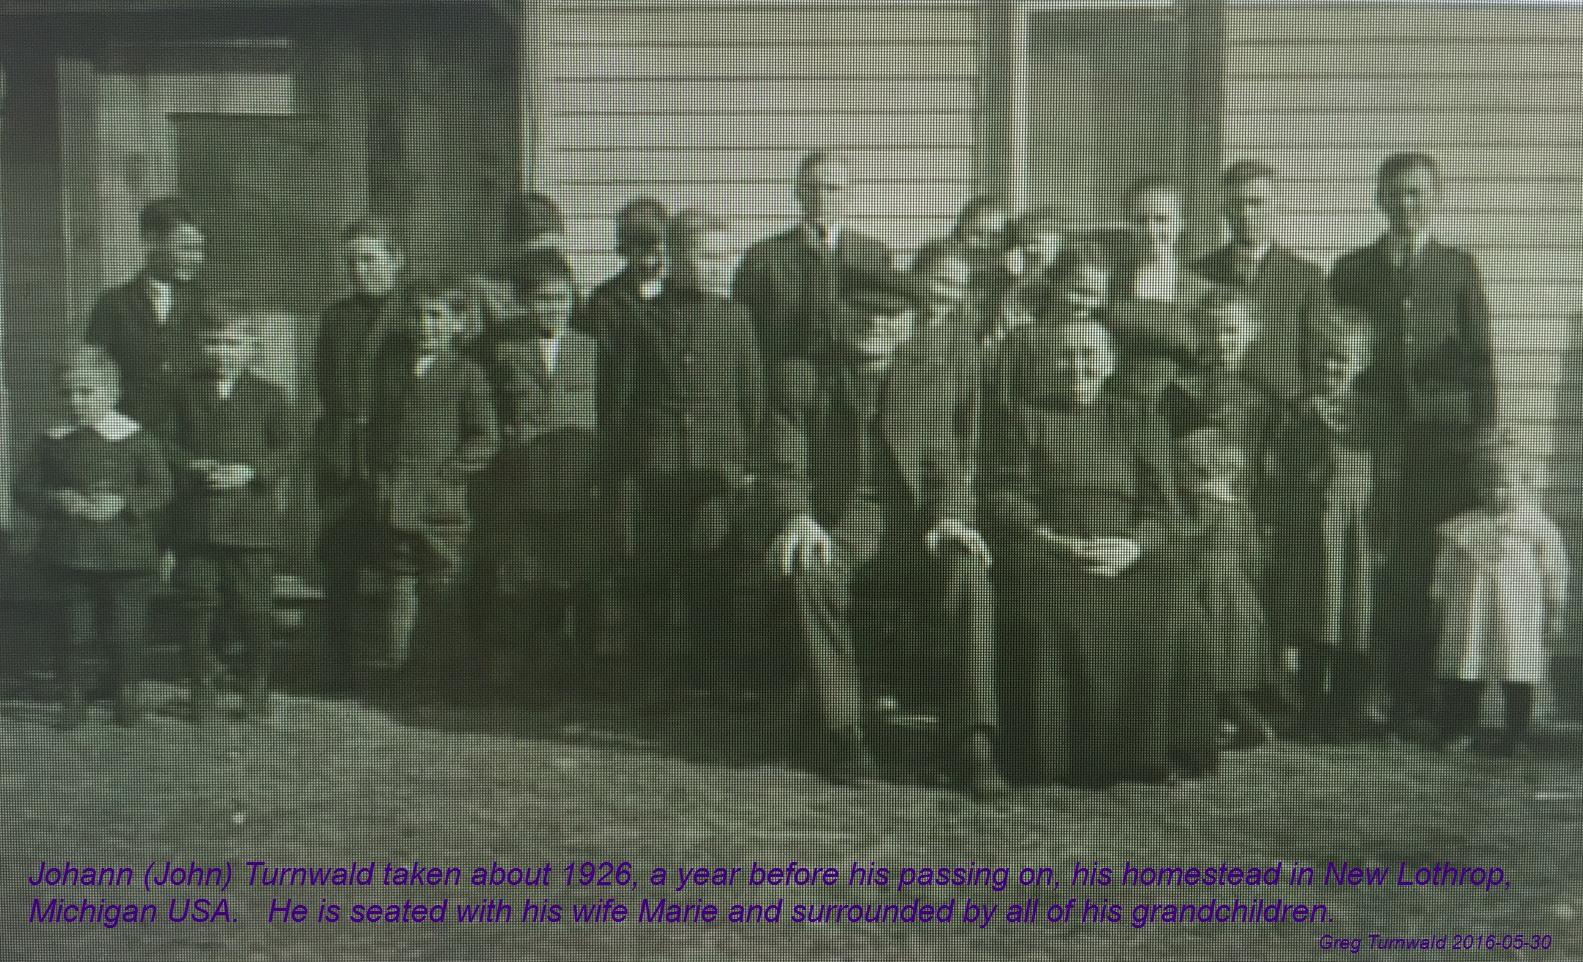 Turnwald_Johann-geb1852_Familienbild-USA1926_516